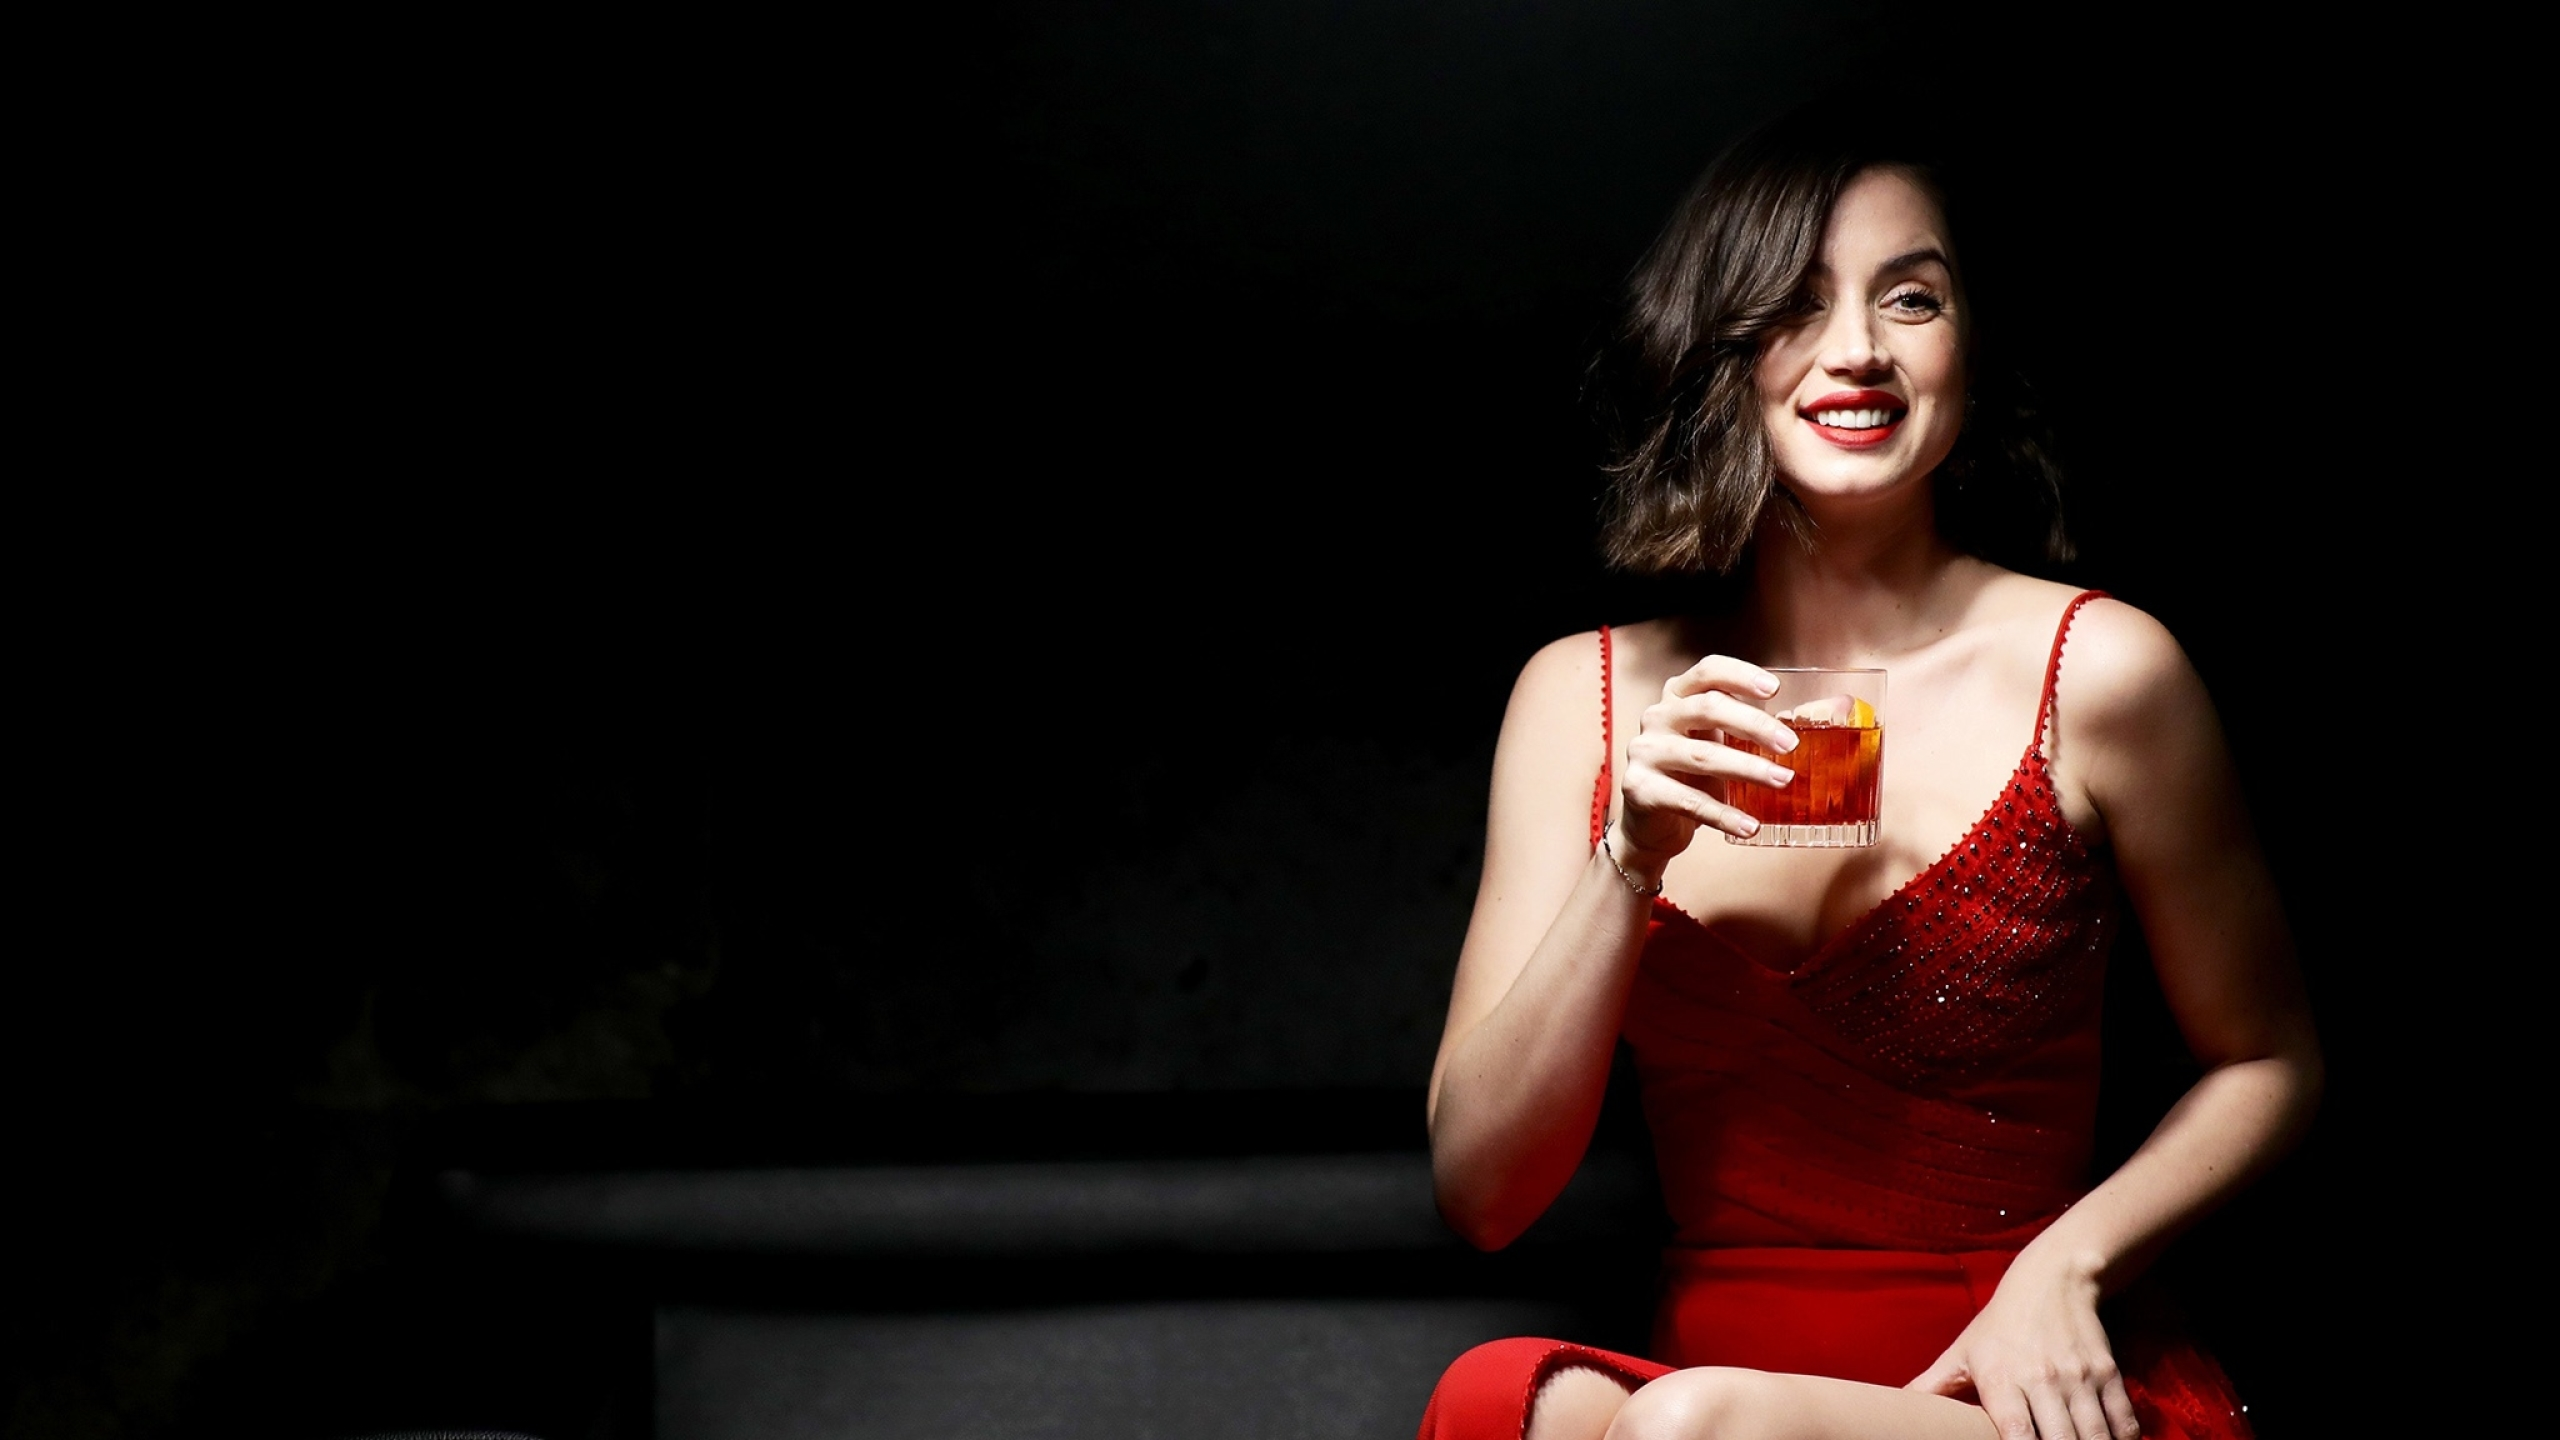 2560x1440 Ana De Armas In Red Dress 1440p Resolution Wallpaper Hd